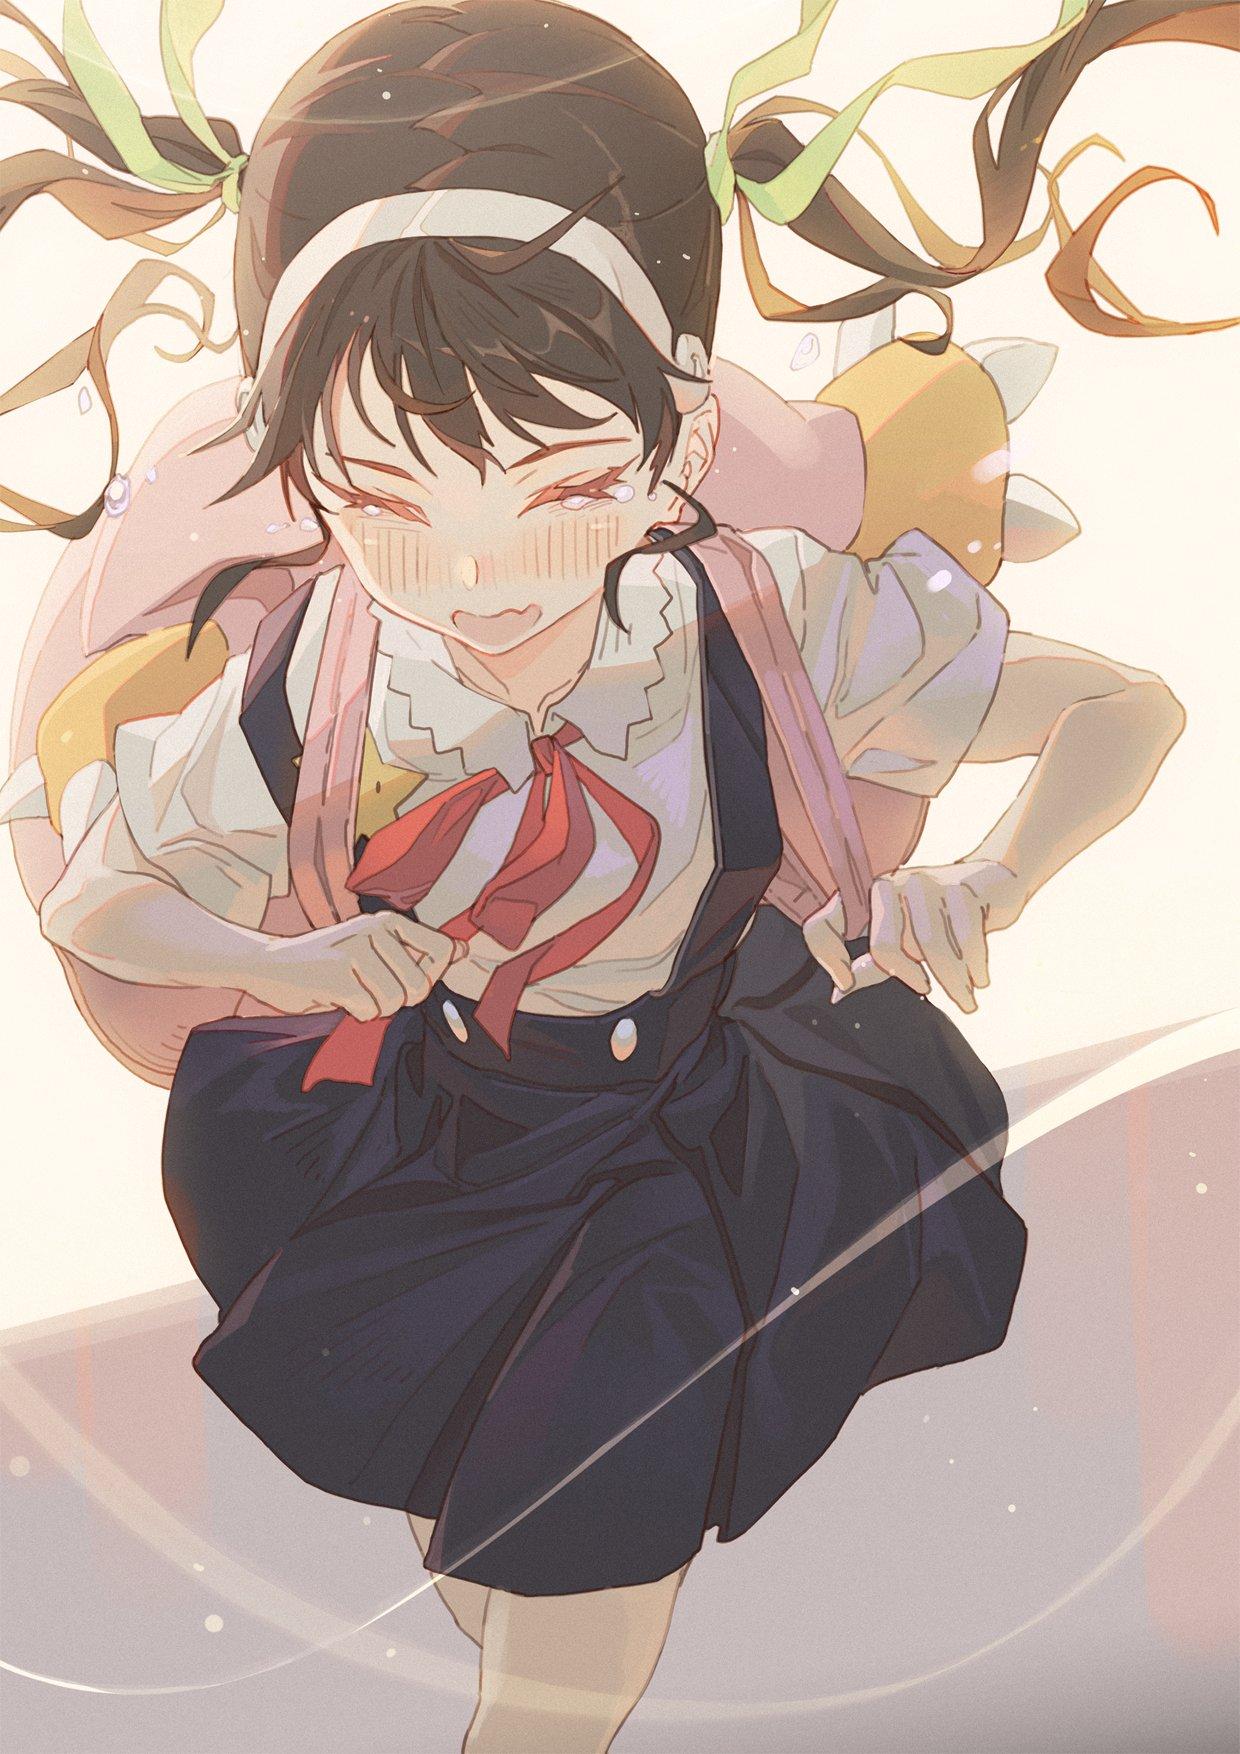 Anime 1240x1754 Monogatari Series anime girls anime Hong Hachikuji Mayoi school uniform tears twintails brunette loli